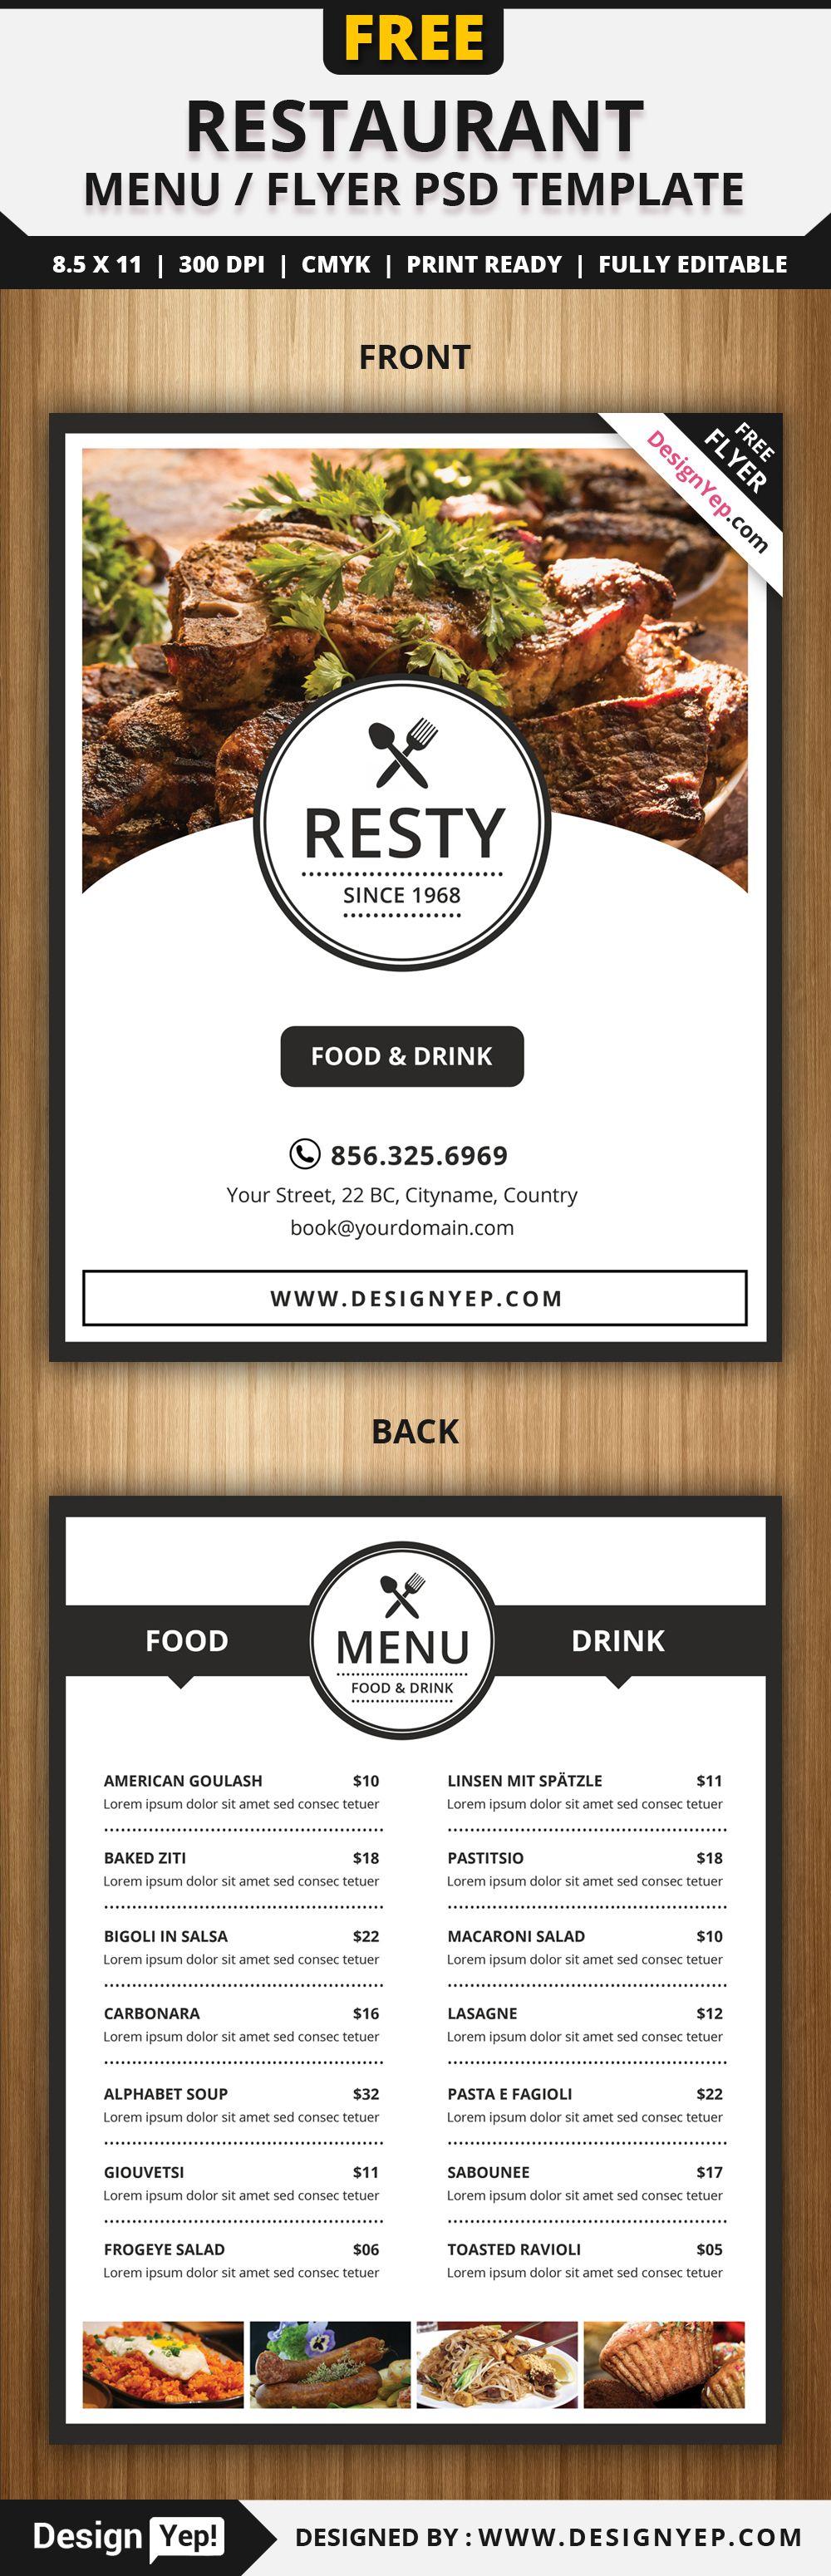 Menu Flyers Free Templates | Free Restaurant Menu Flyer Psd Template Mexico Pinterest